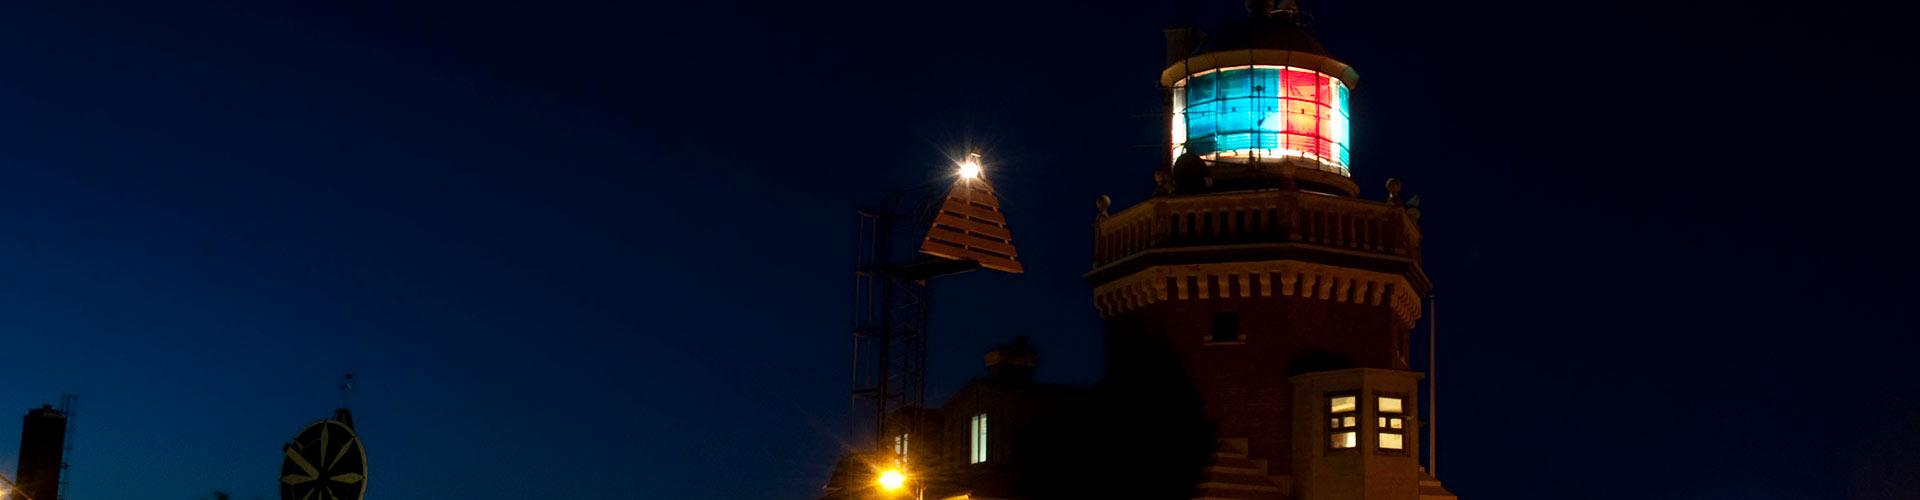 Fyr i Helsingborgs hamn